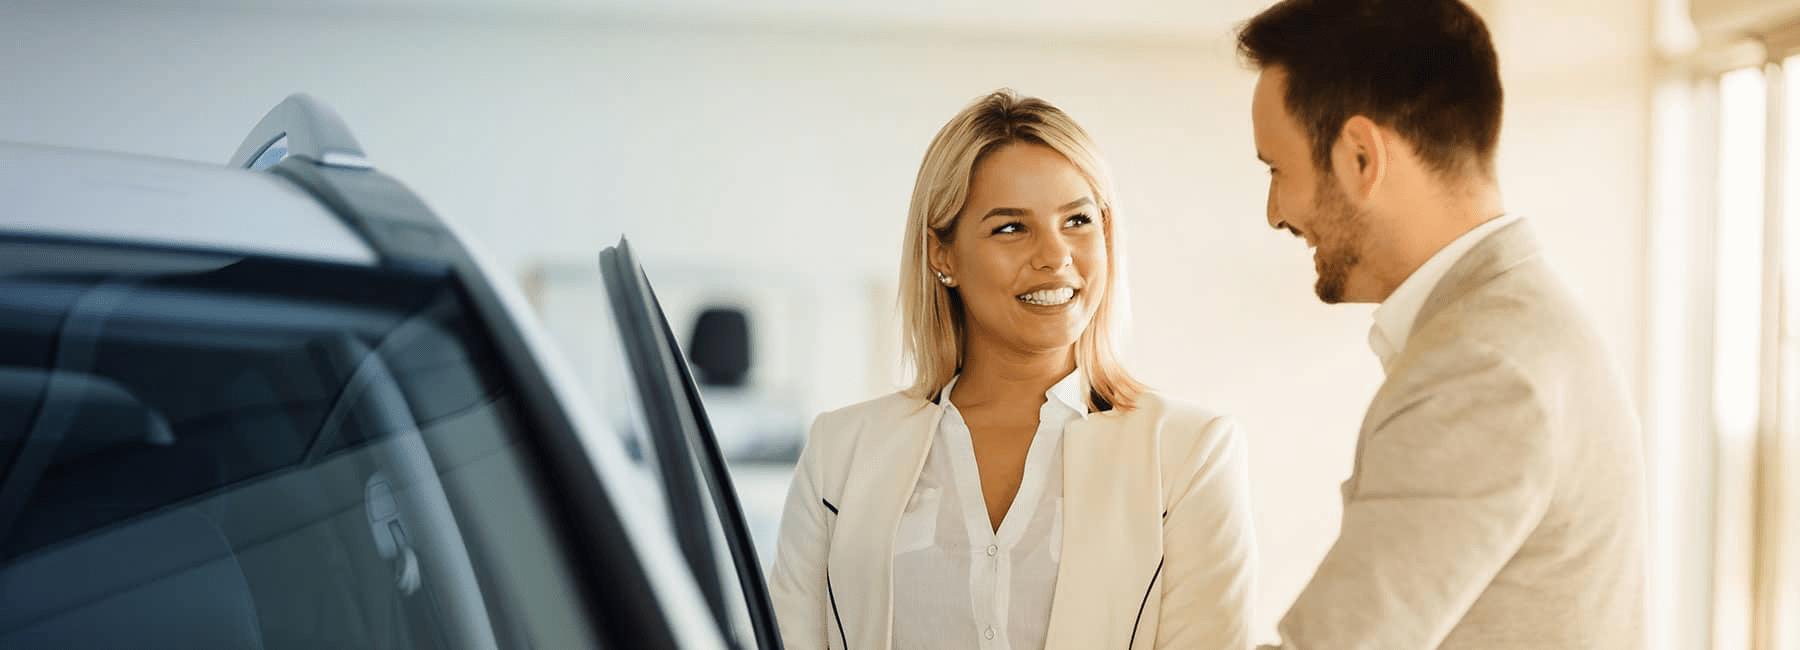 car salesman shows happy woman car in showroom